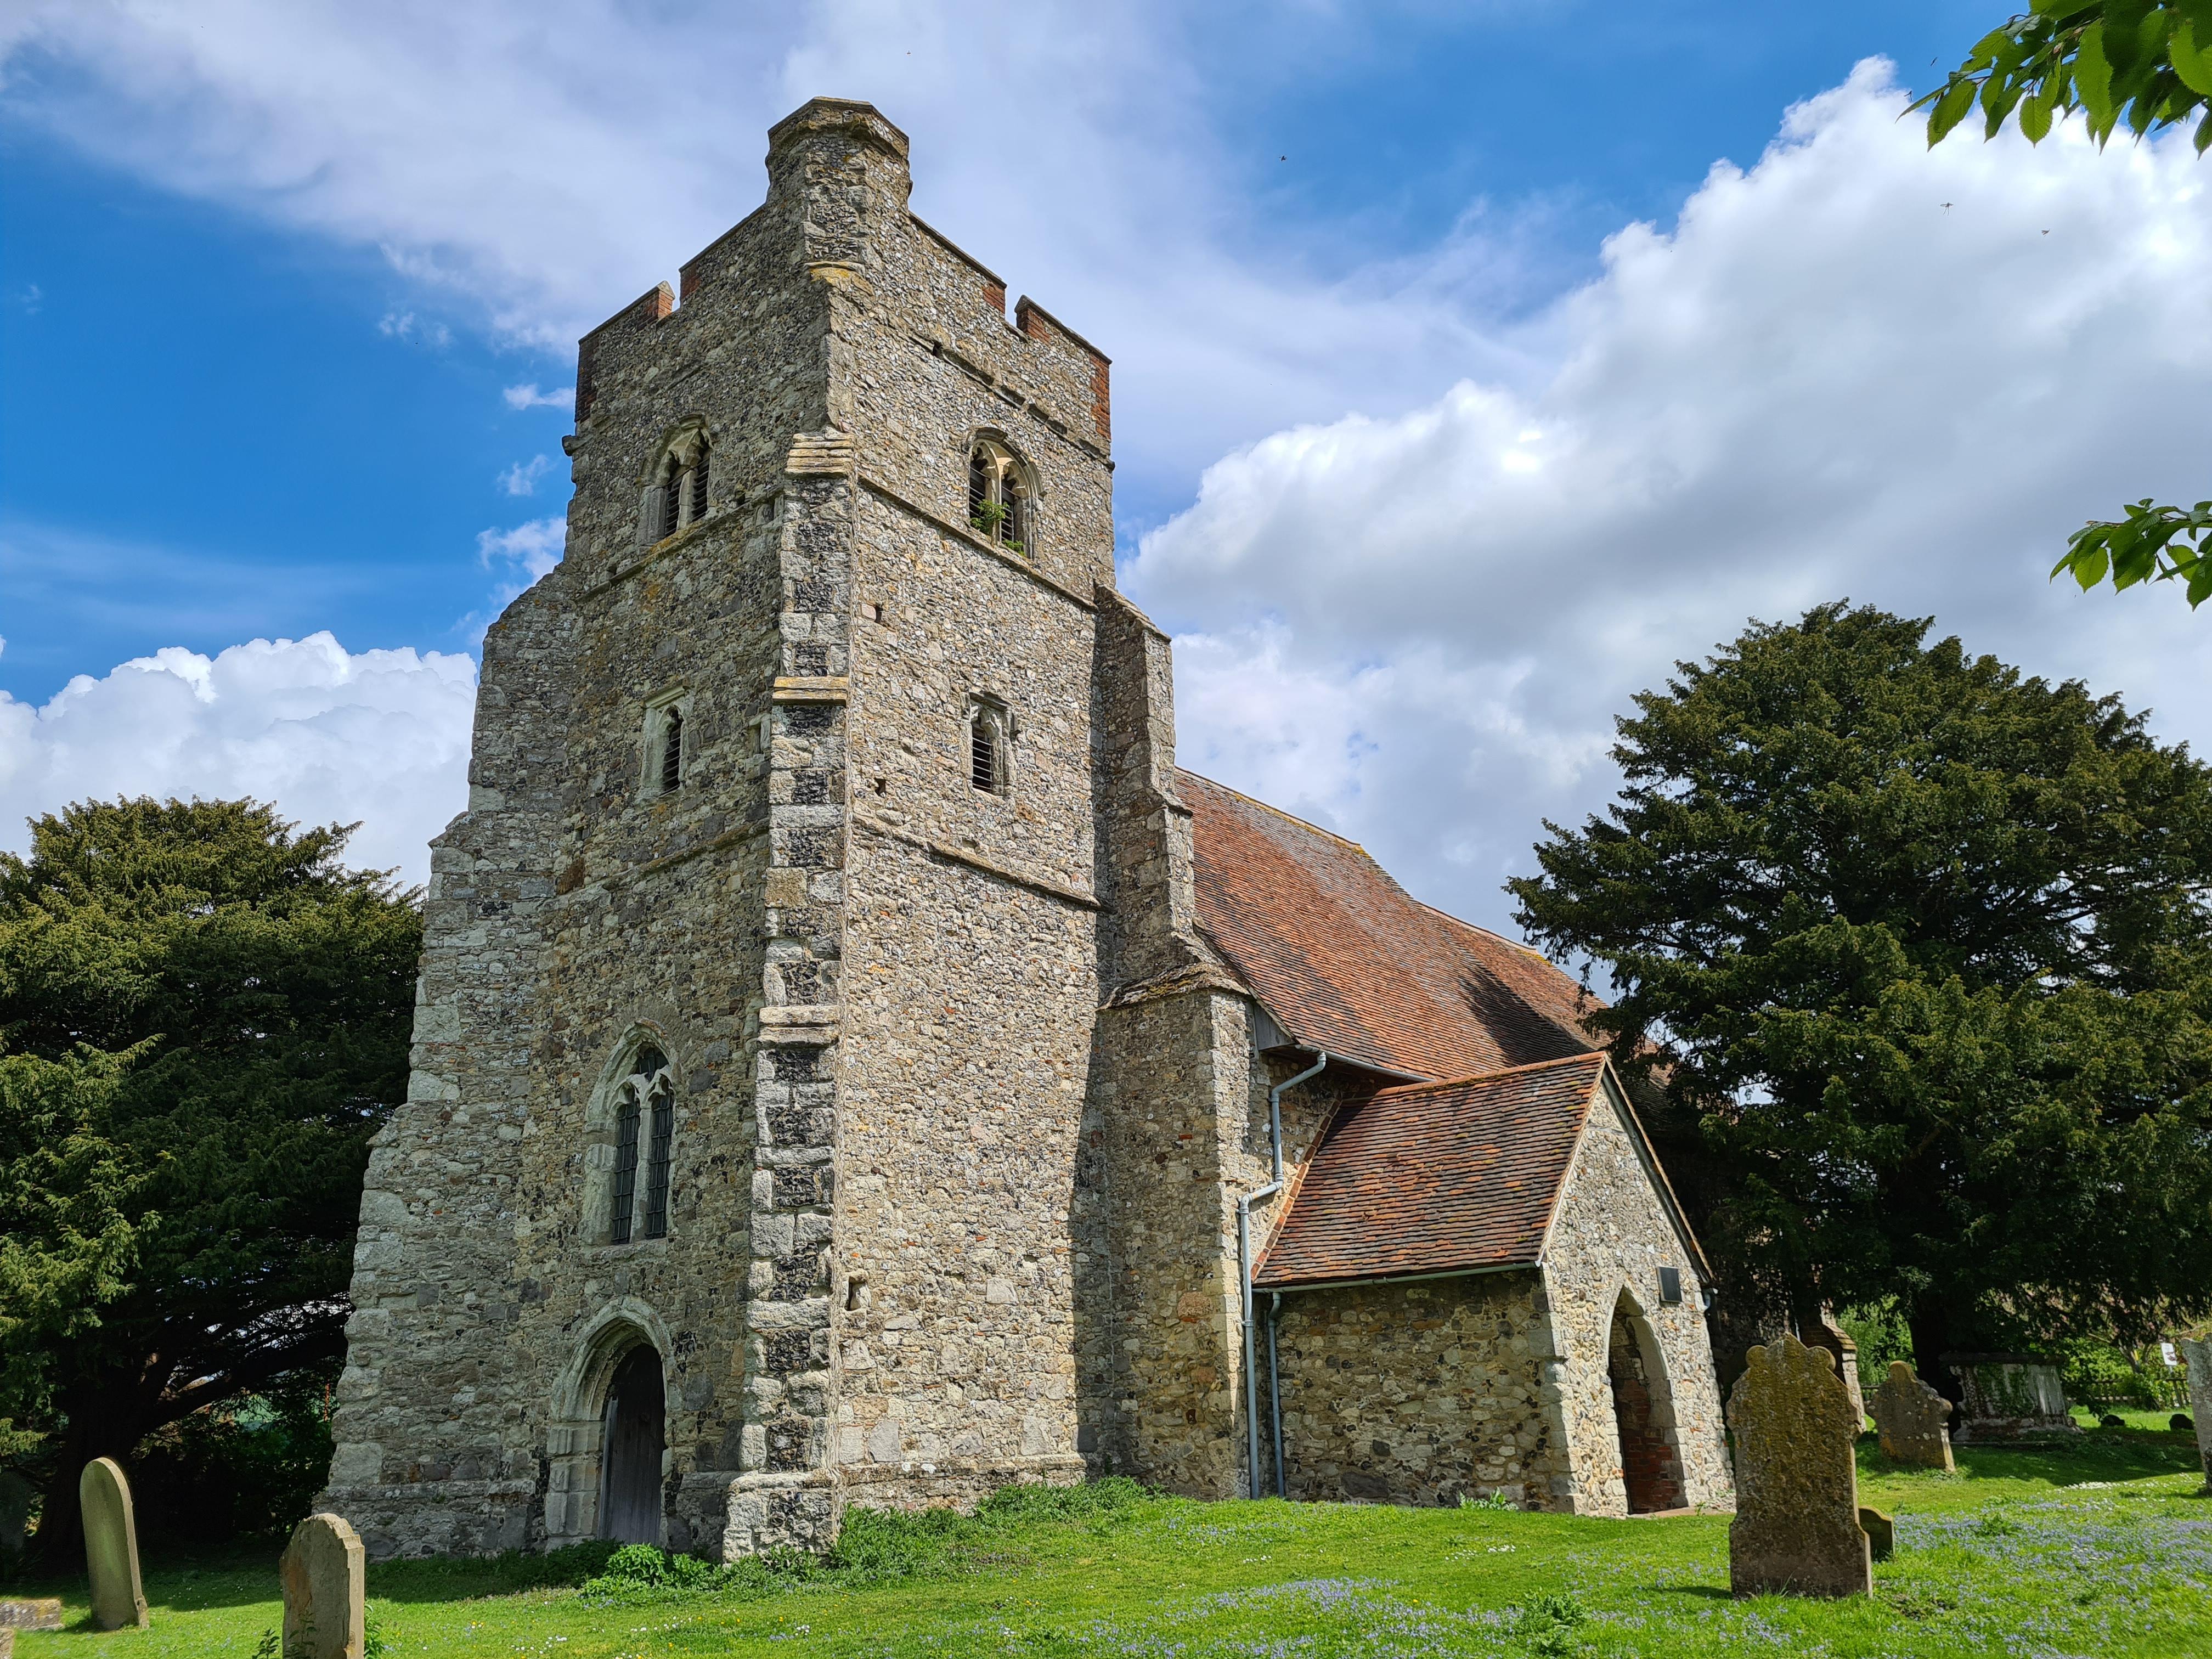 St. Mary, Burham